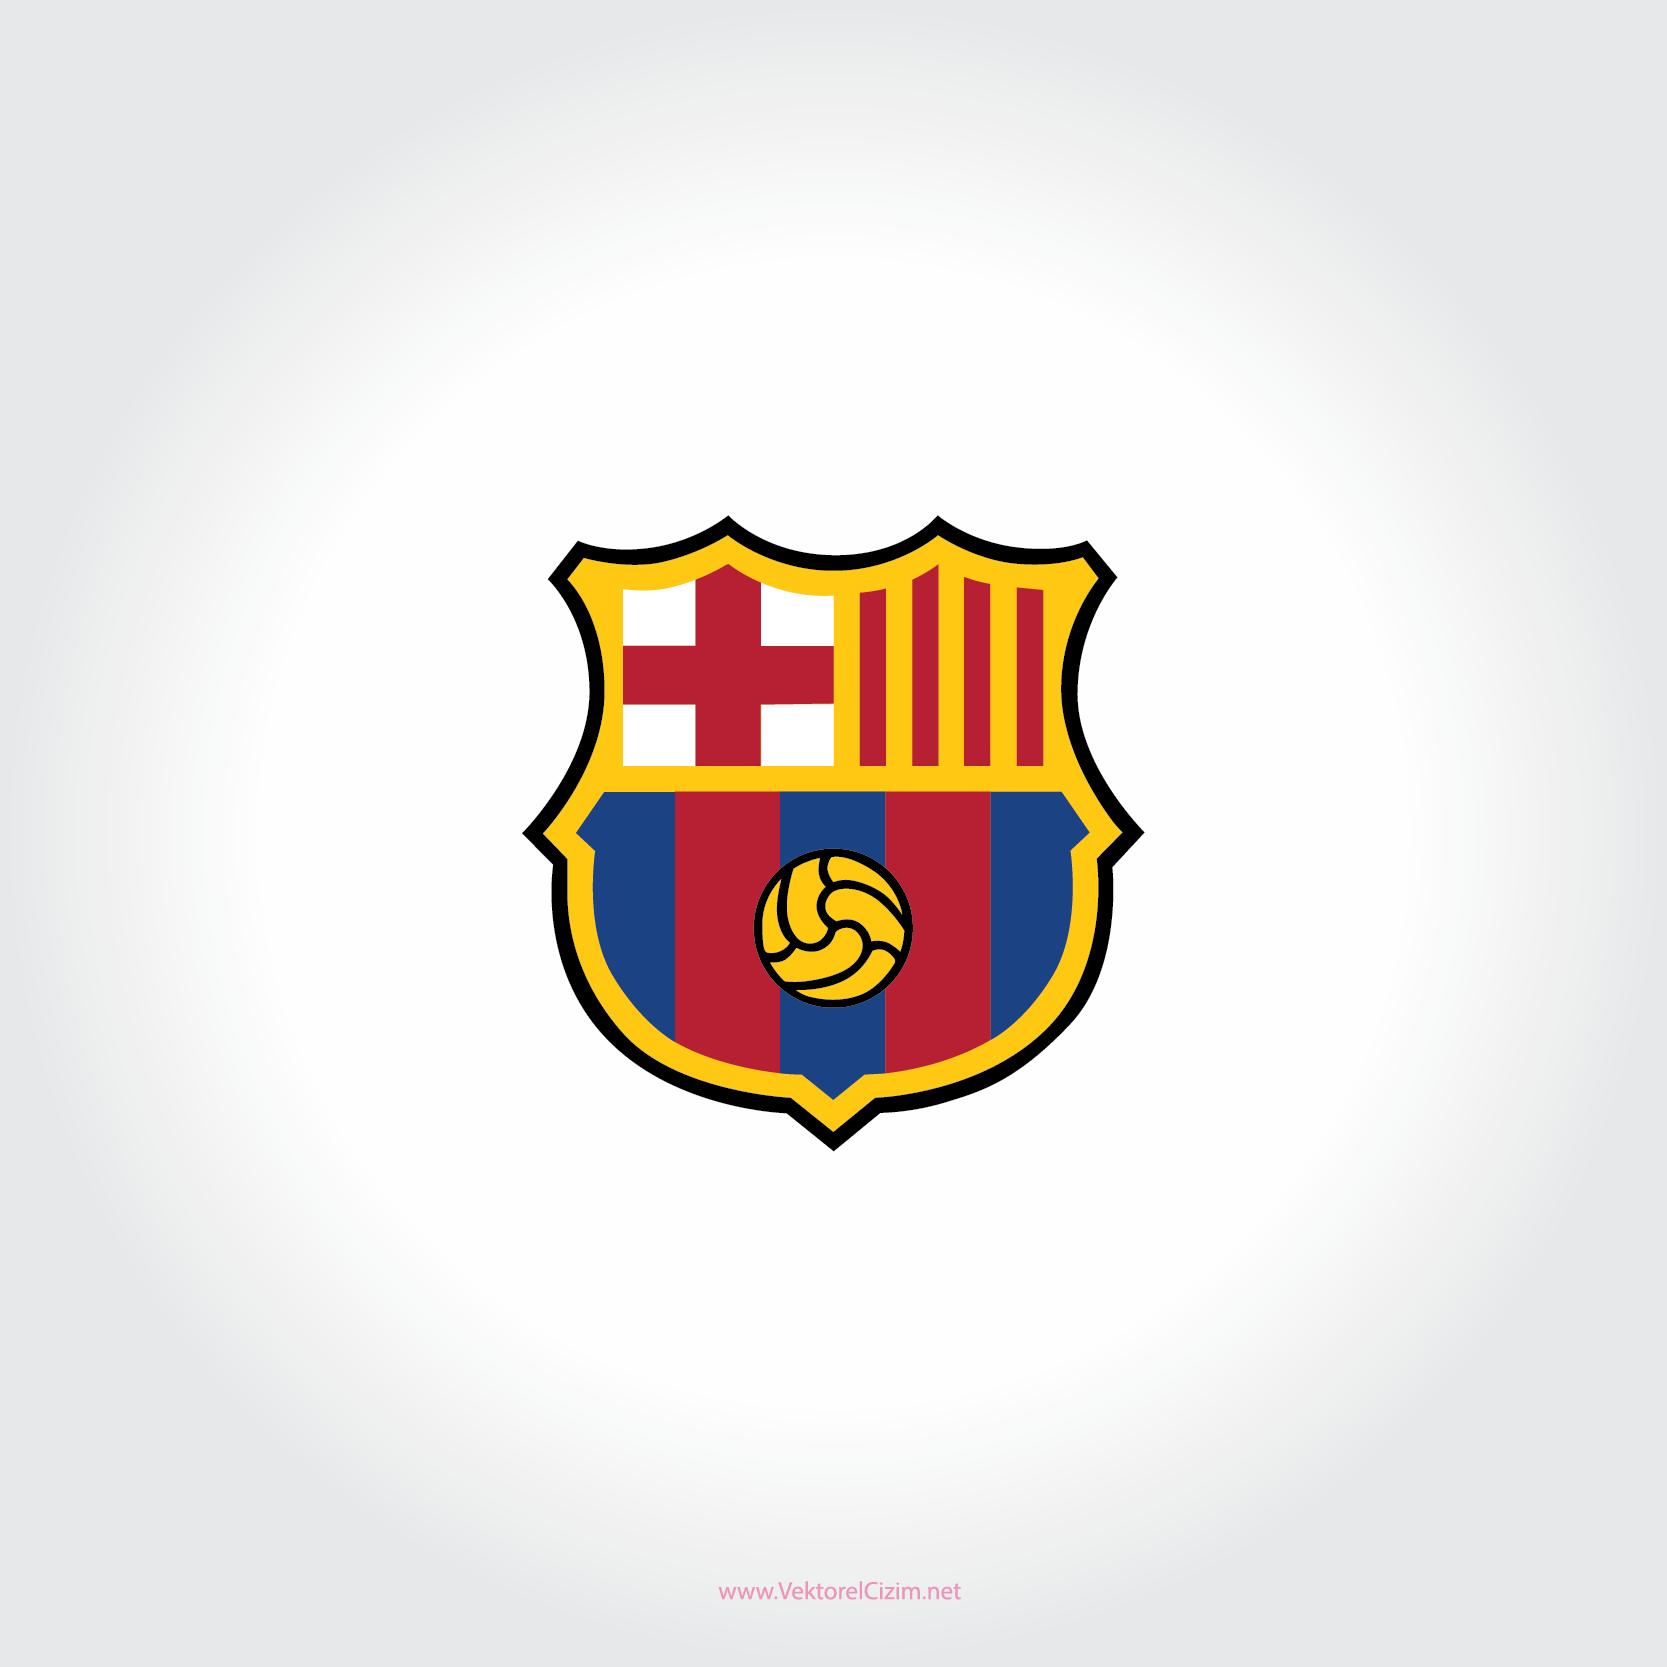 Vektörel Çizim Barcelona New Logo Vector Download